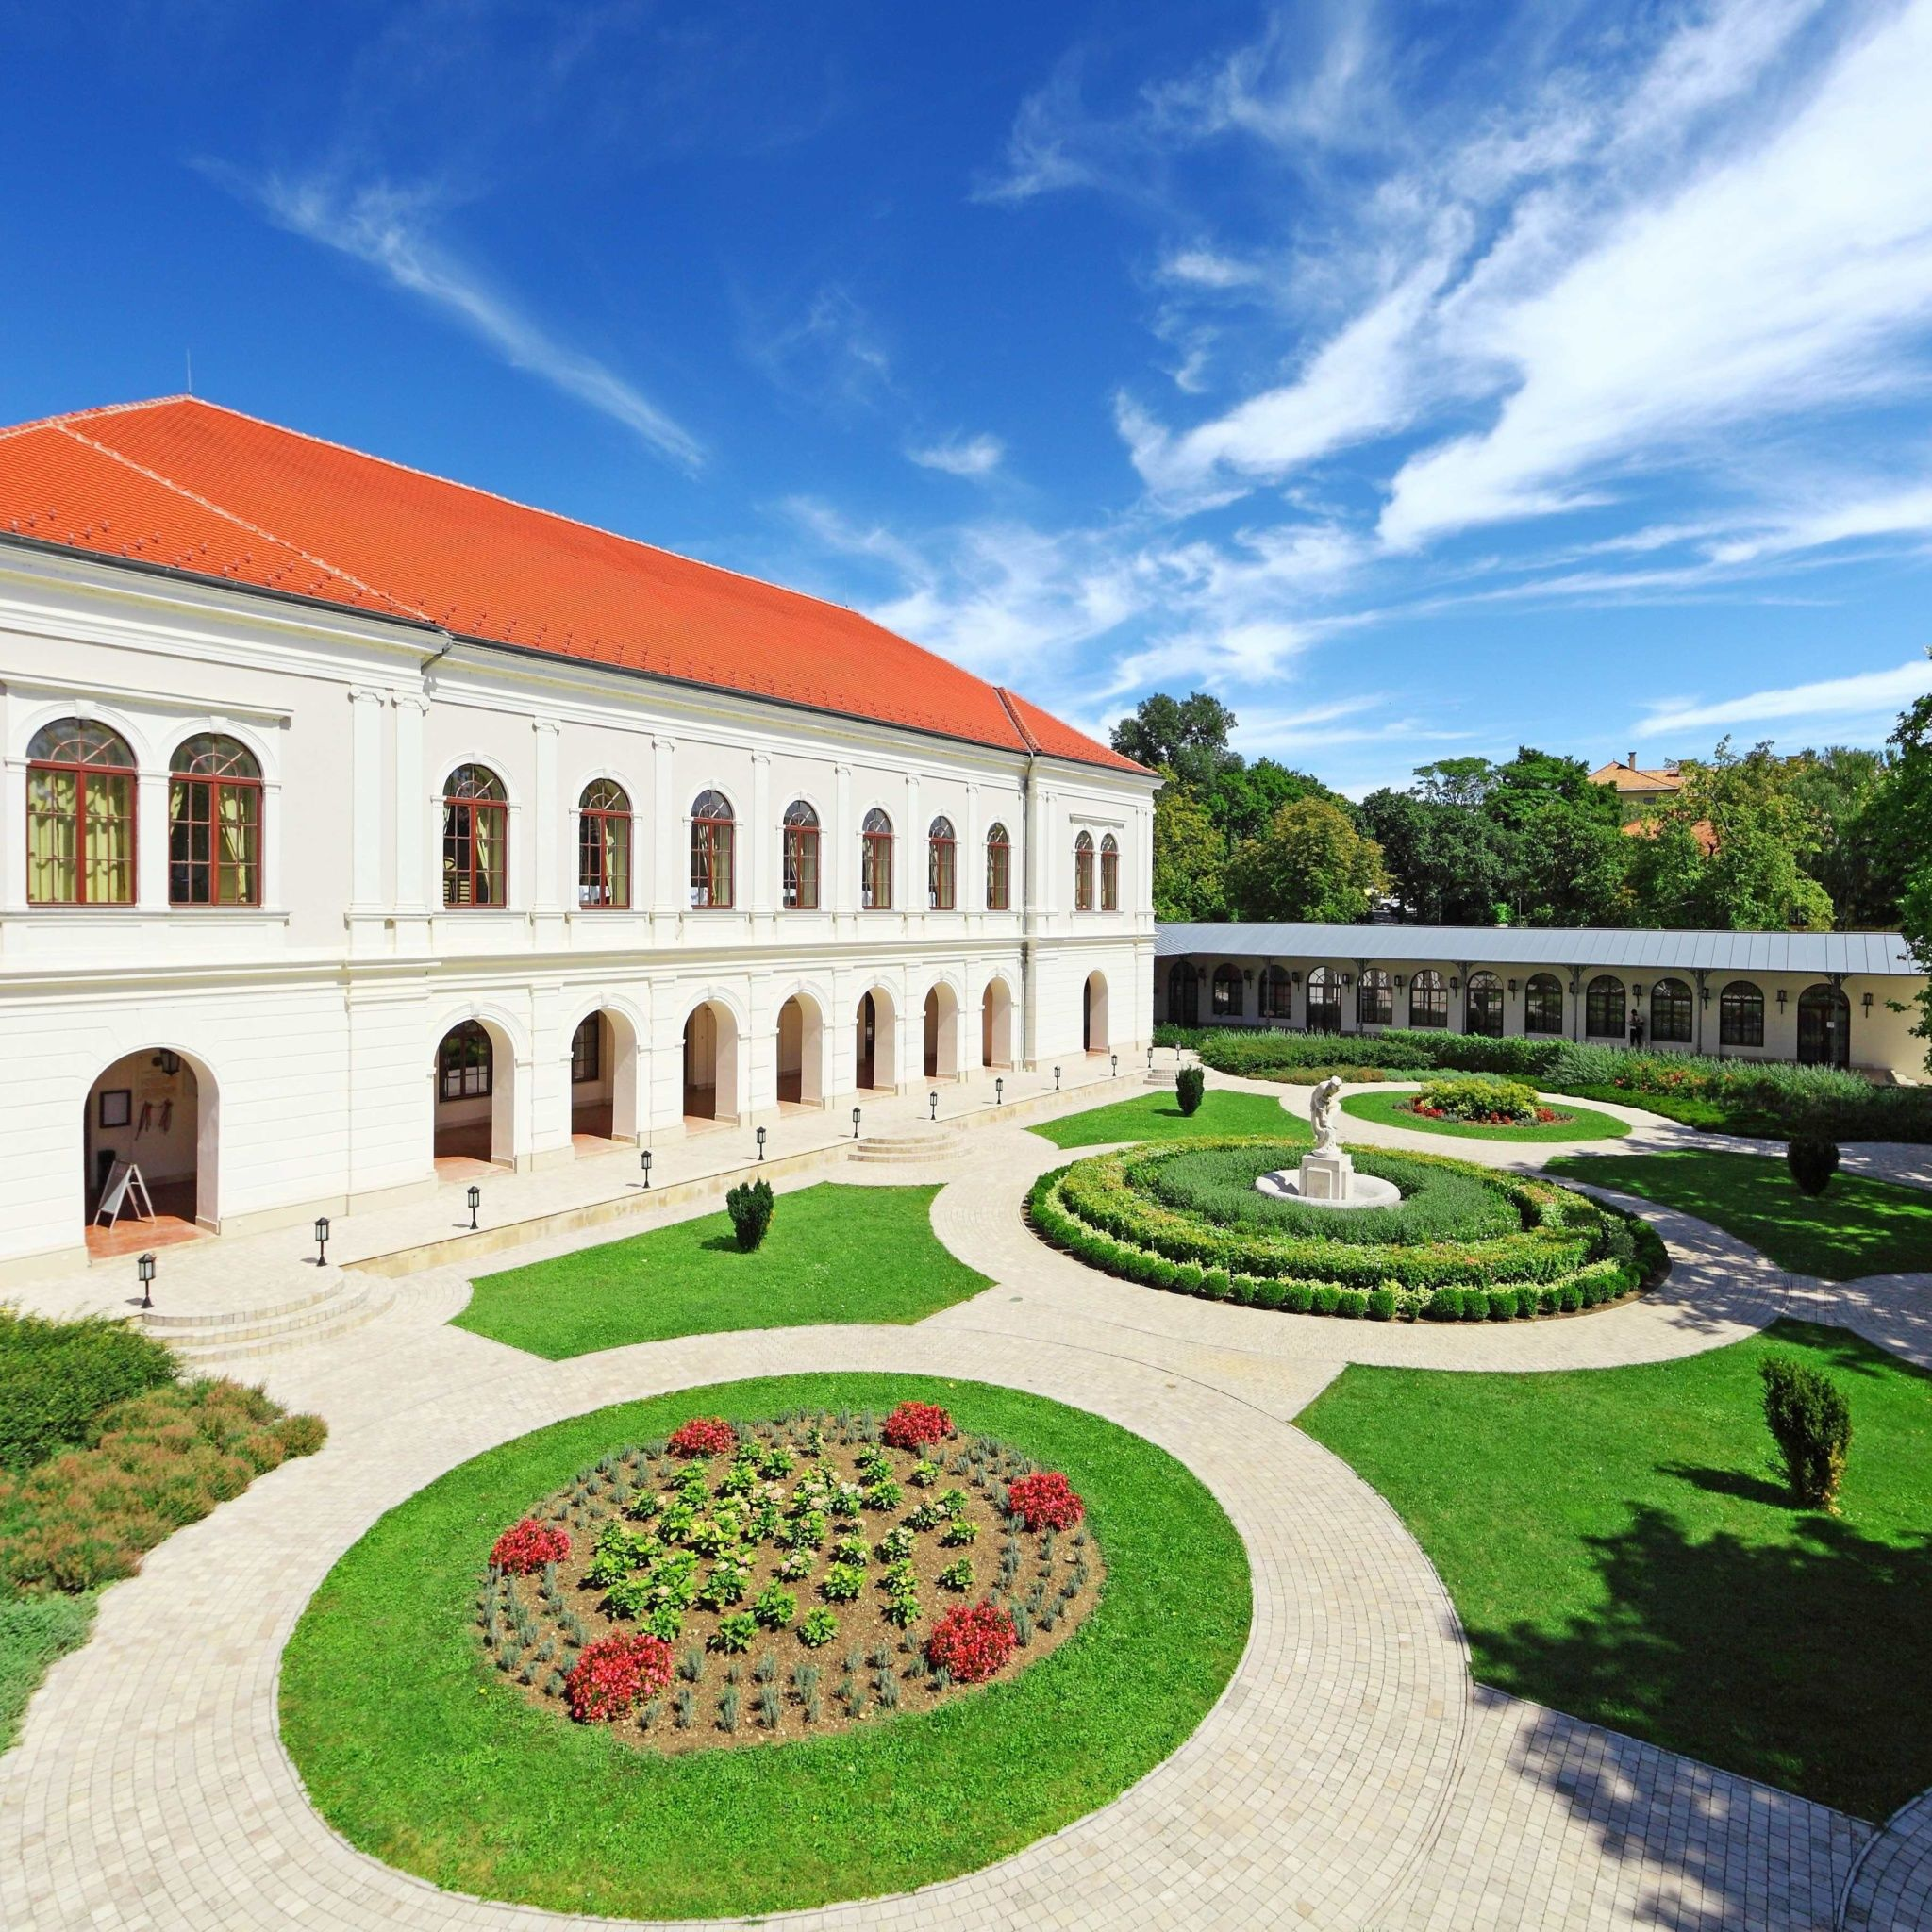 Anna Grand Hotel Wine&Vital Balatonfüred - Díszterem kerttel